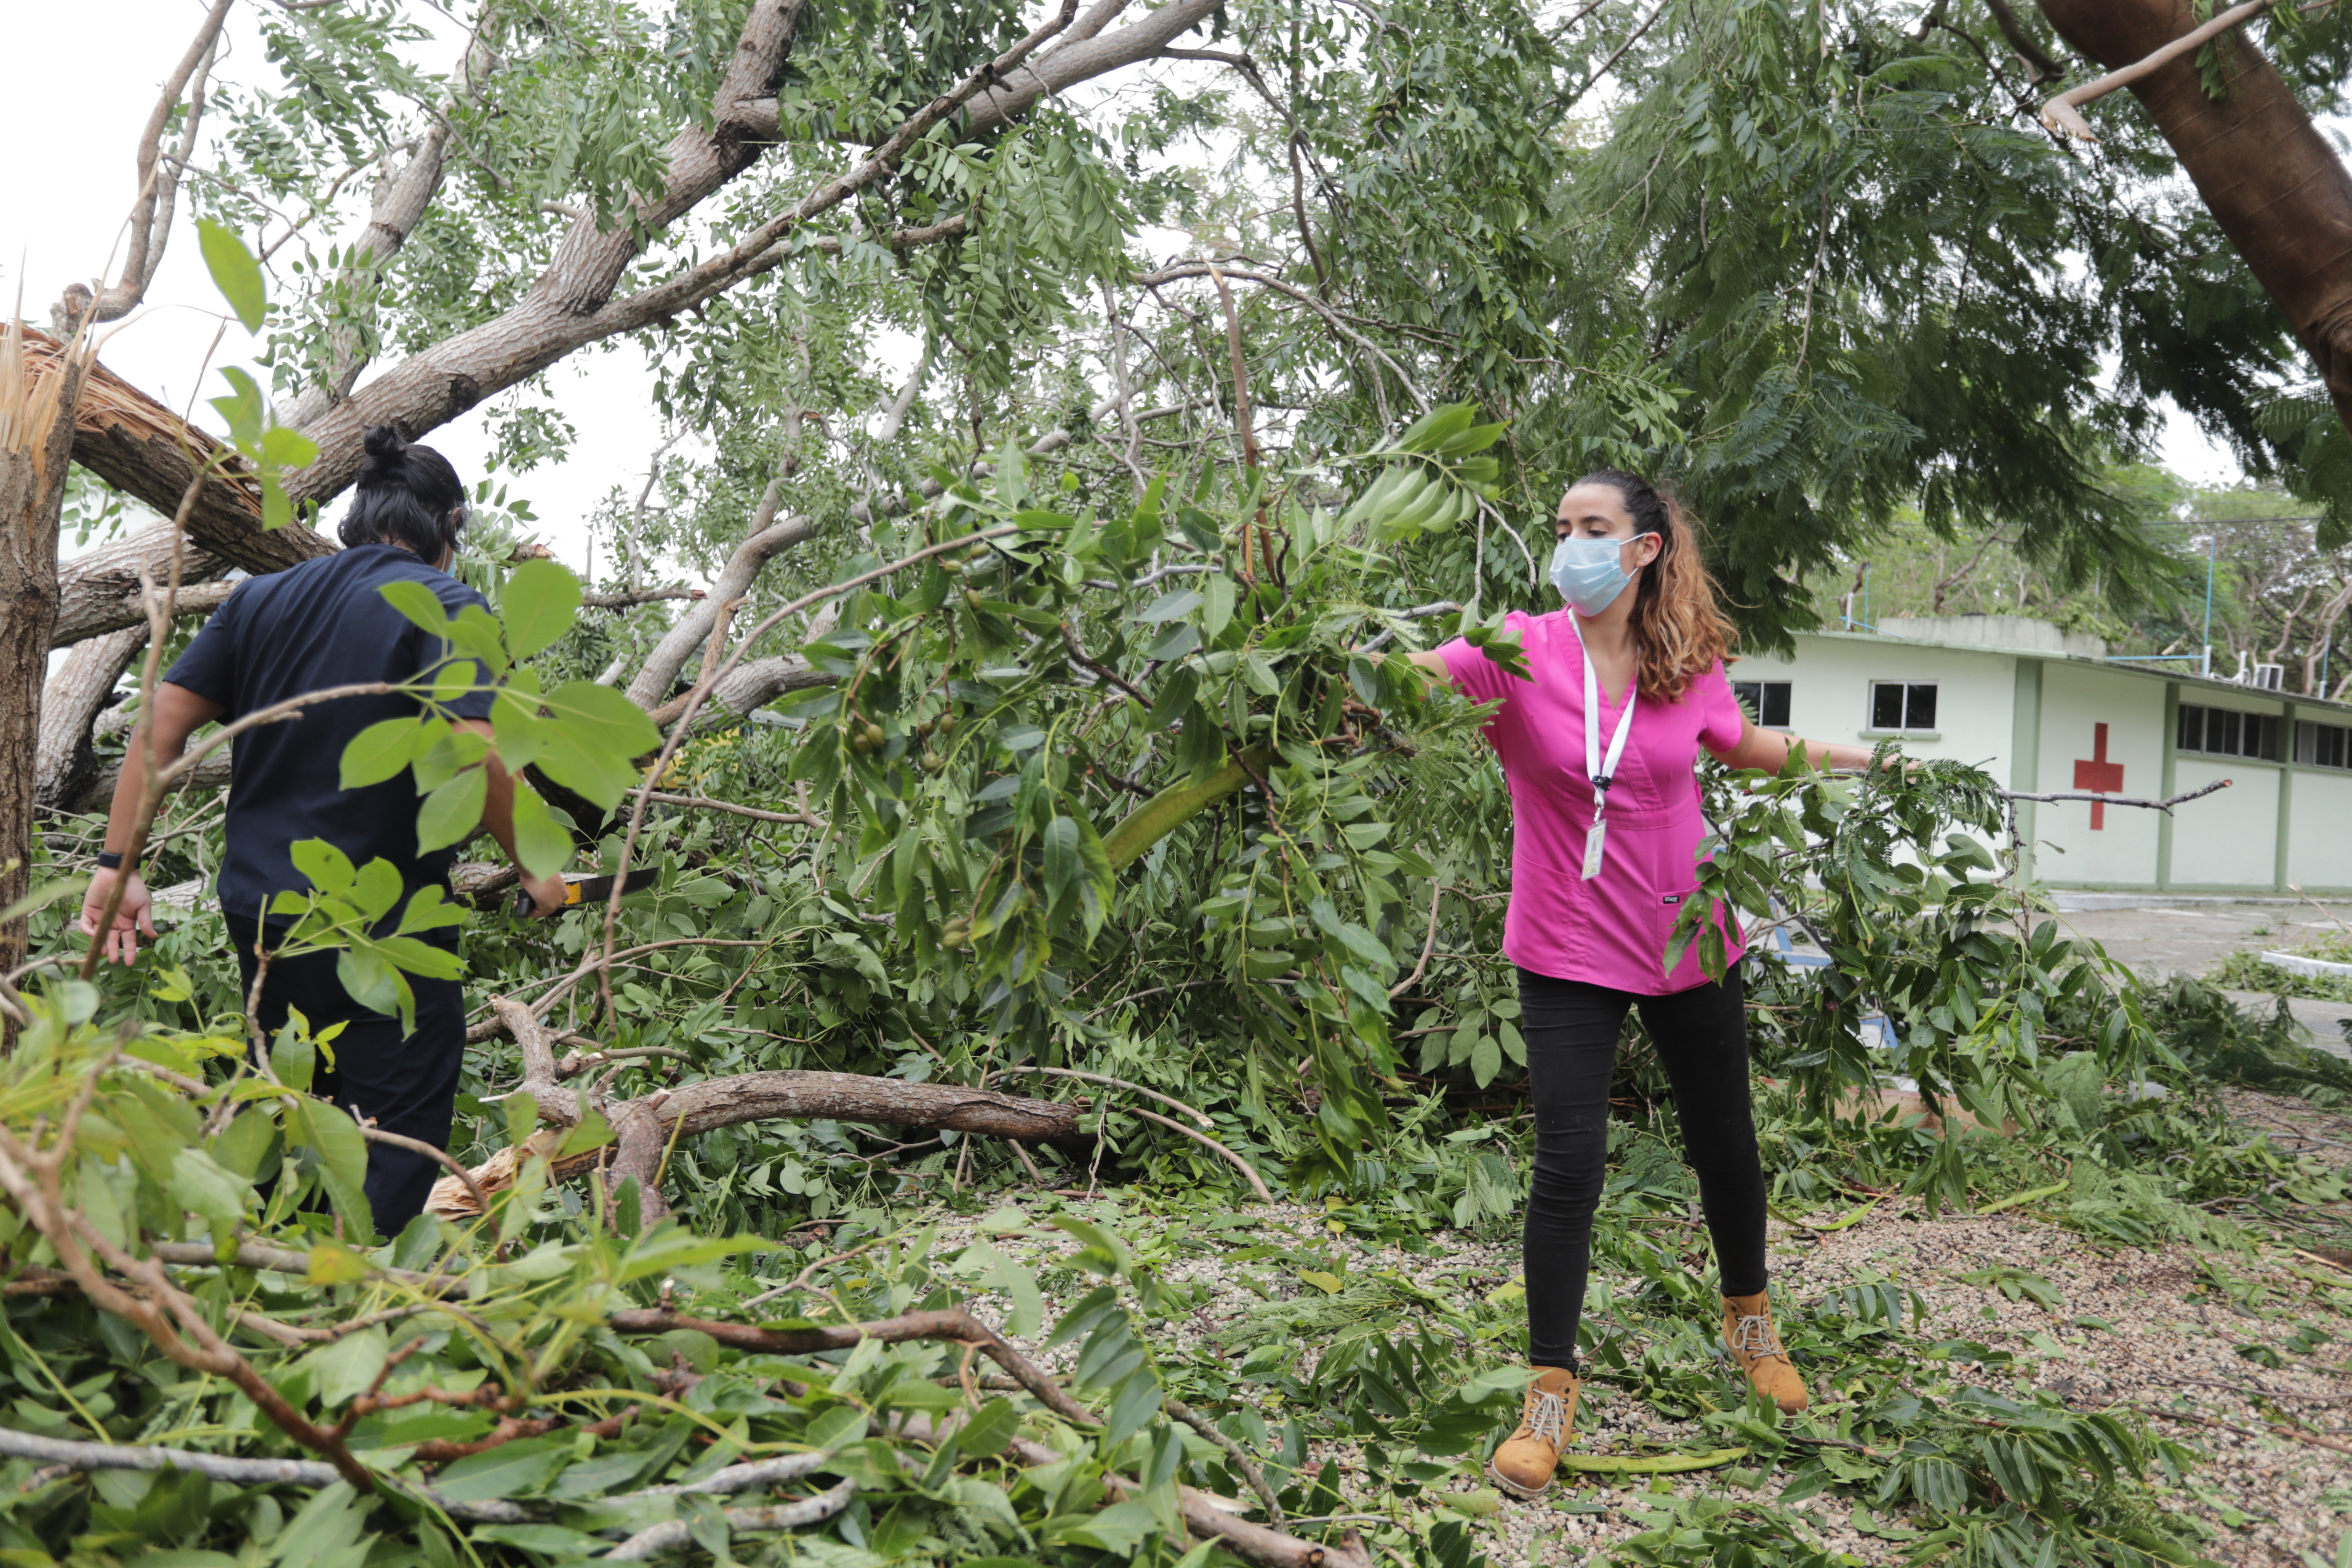 Hurricane Delta reaches the coast of Quintana Roo in Category 3